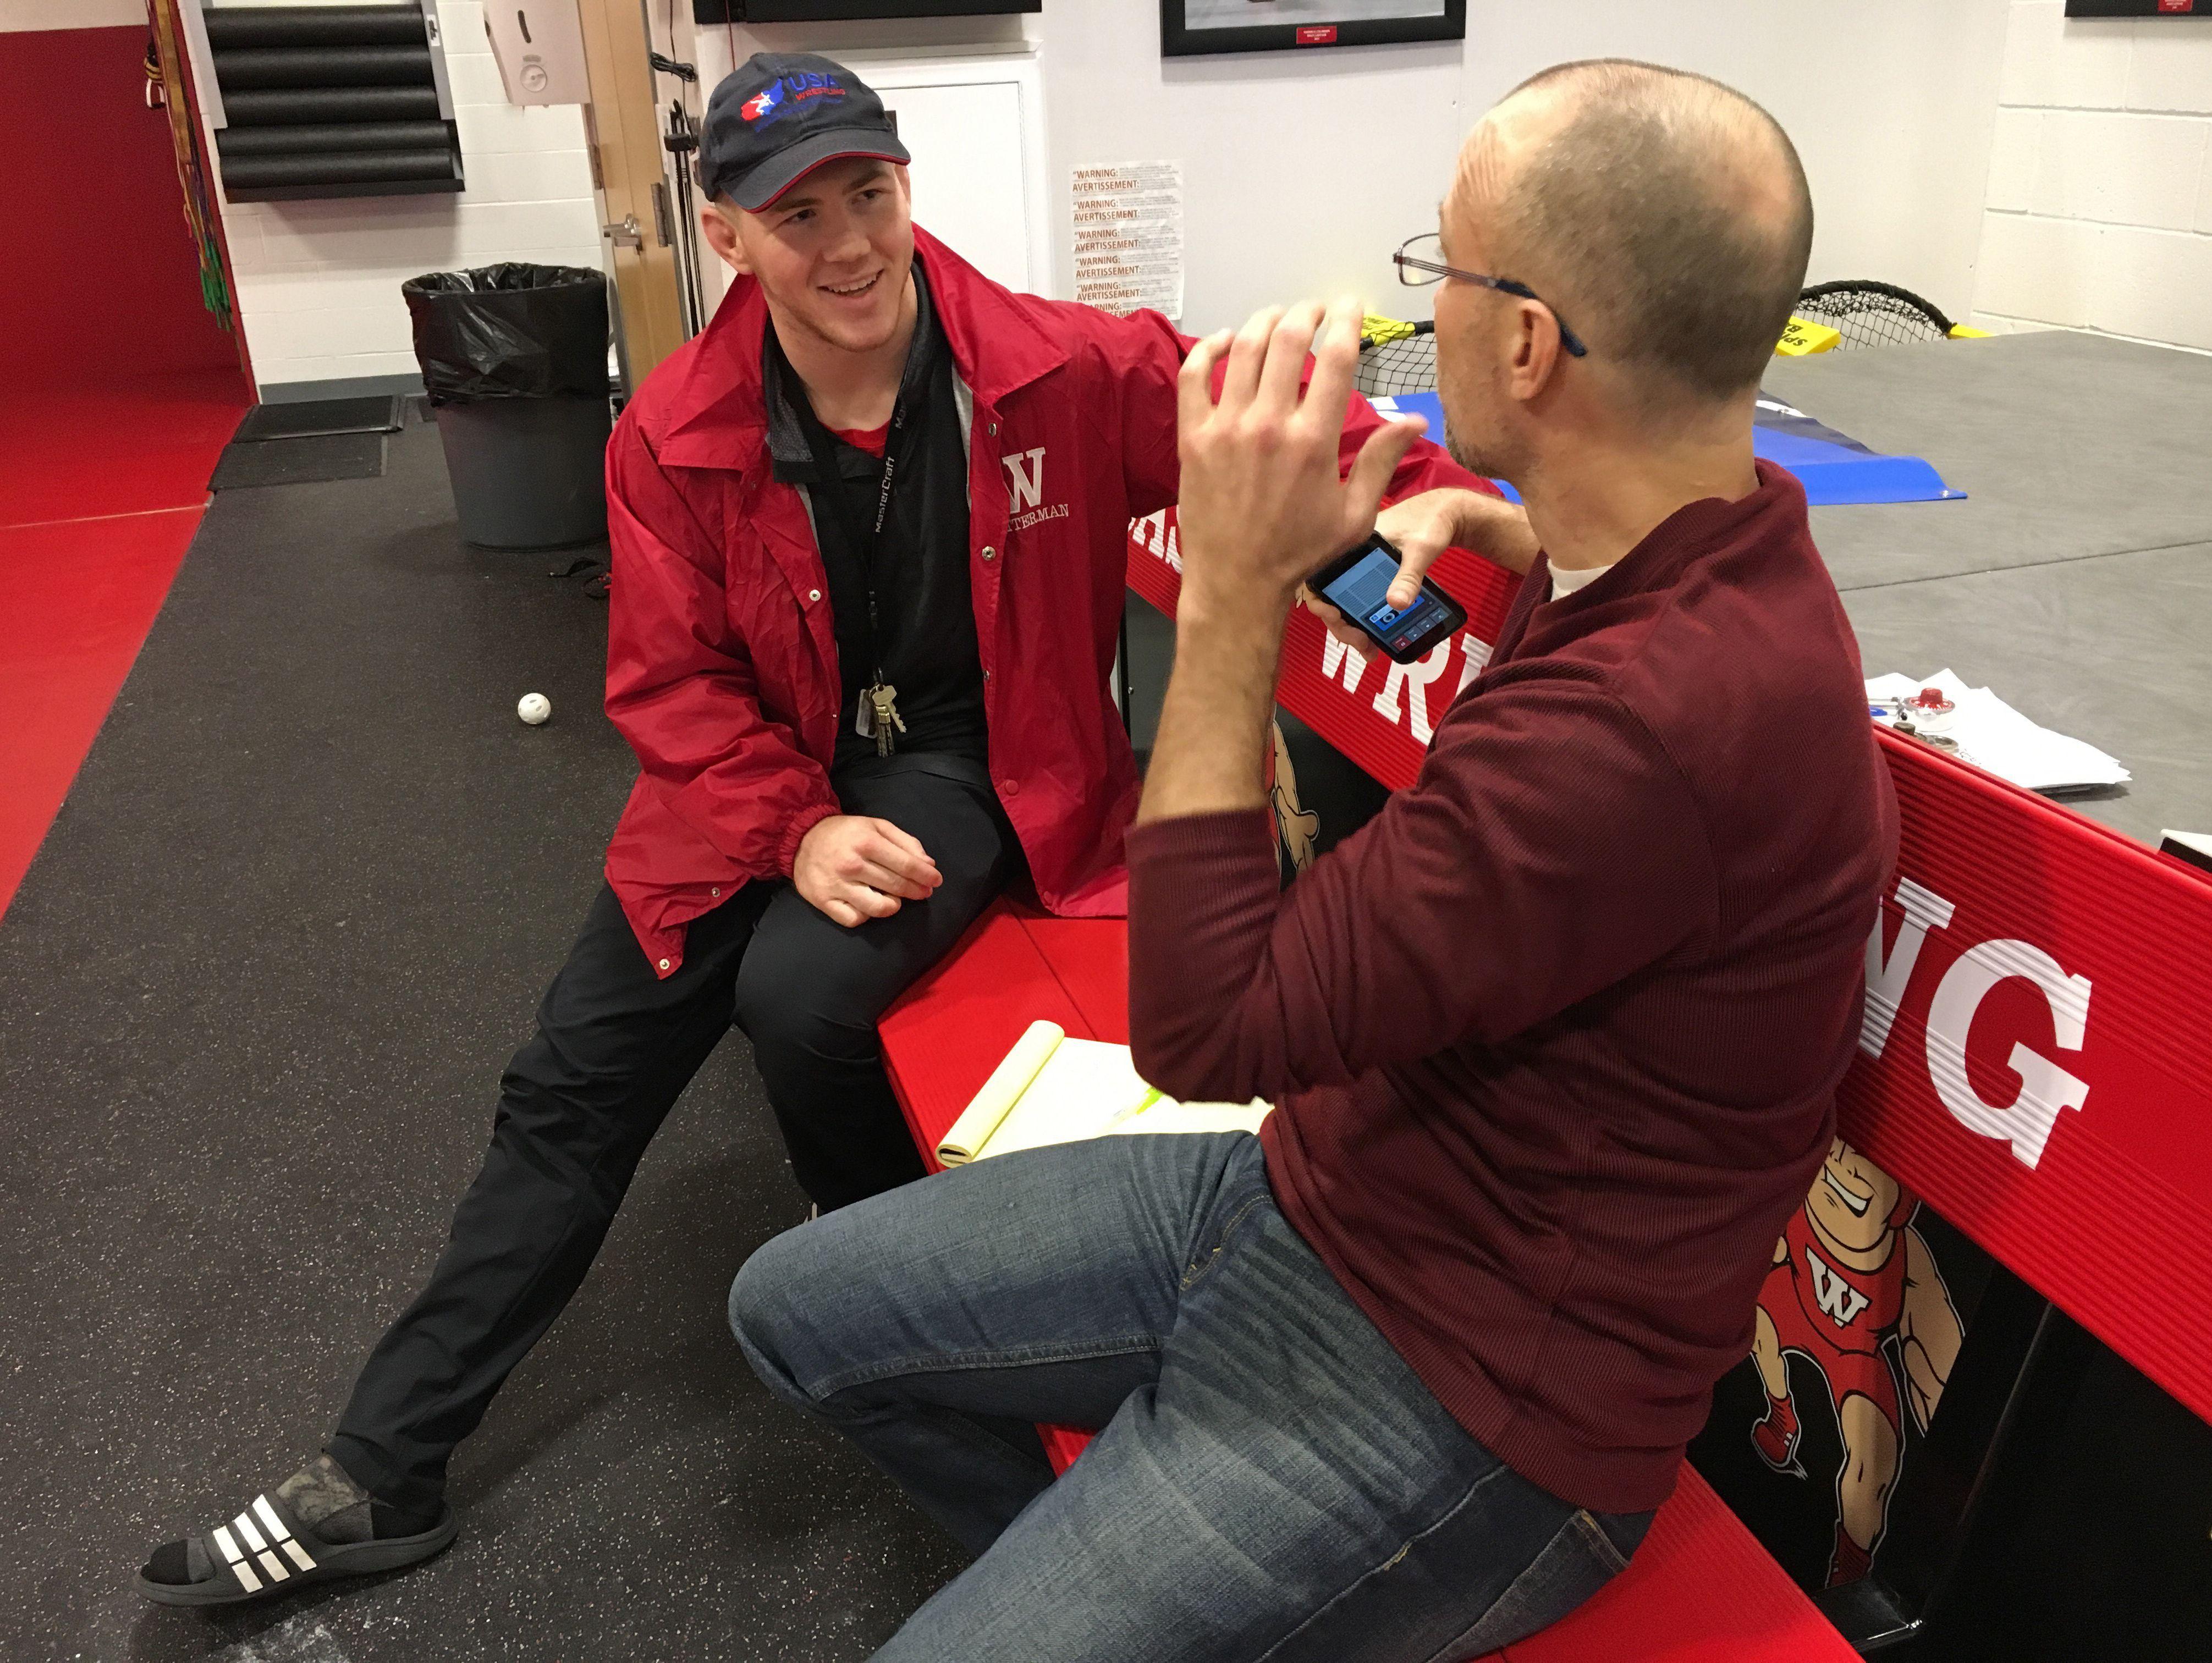 Gregg Doyel talks with Riley Lefever, a wrestler from Wabash College.